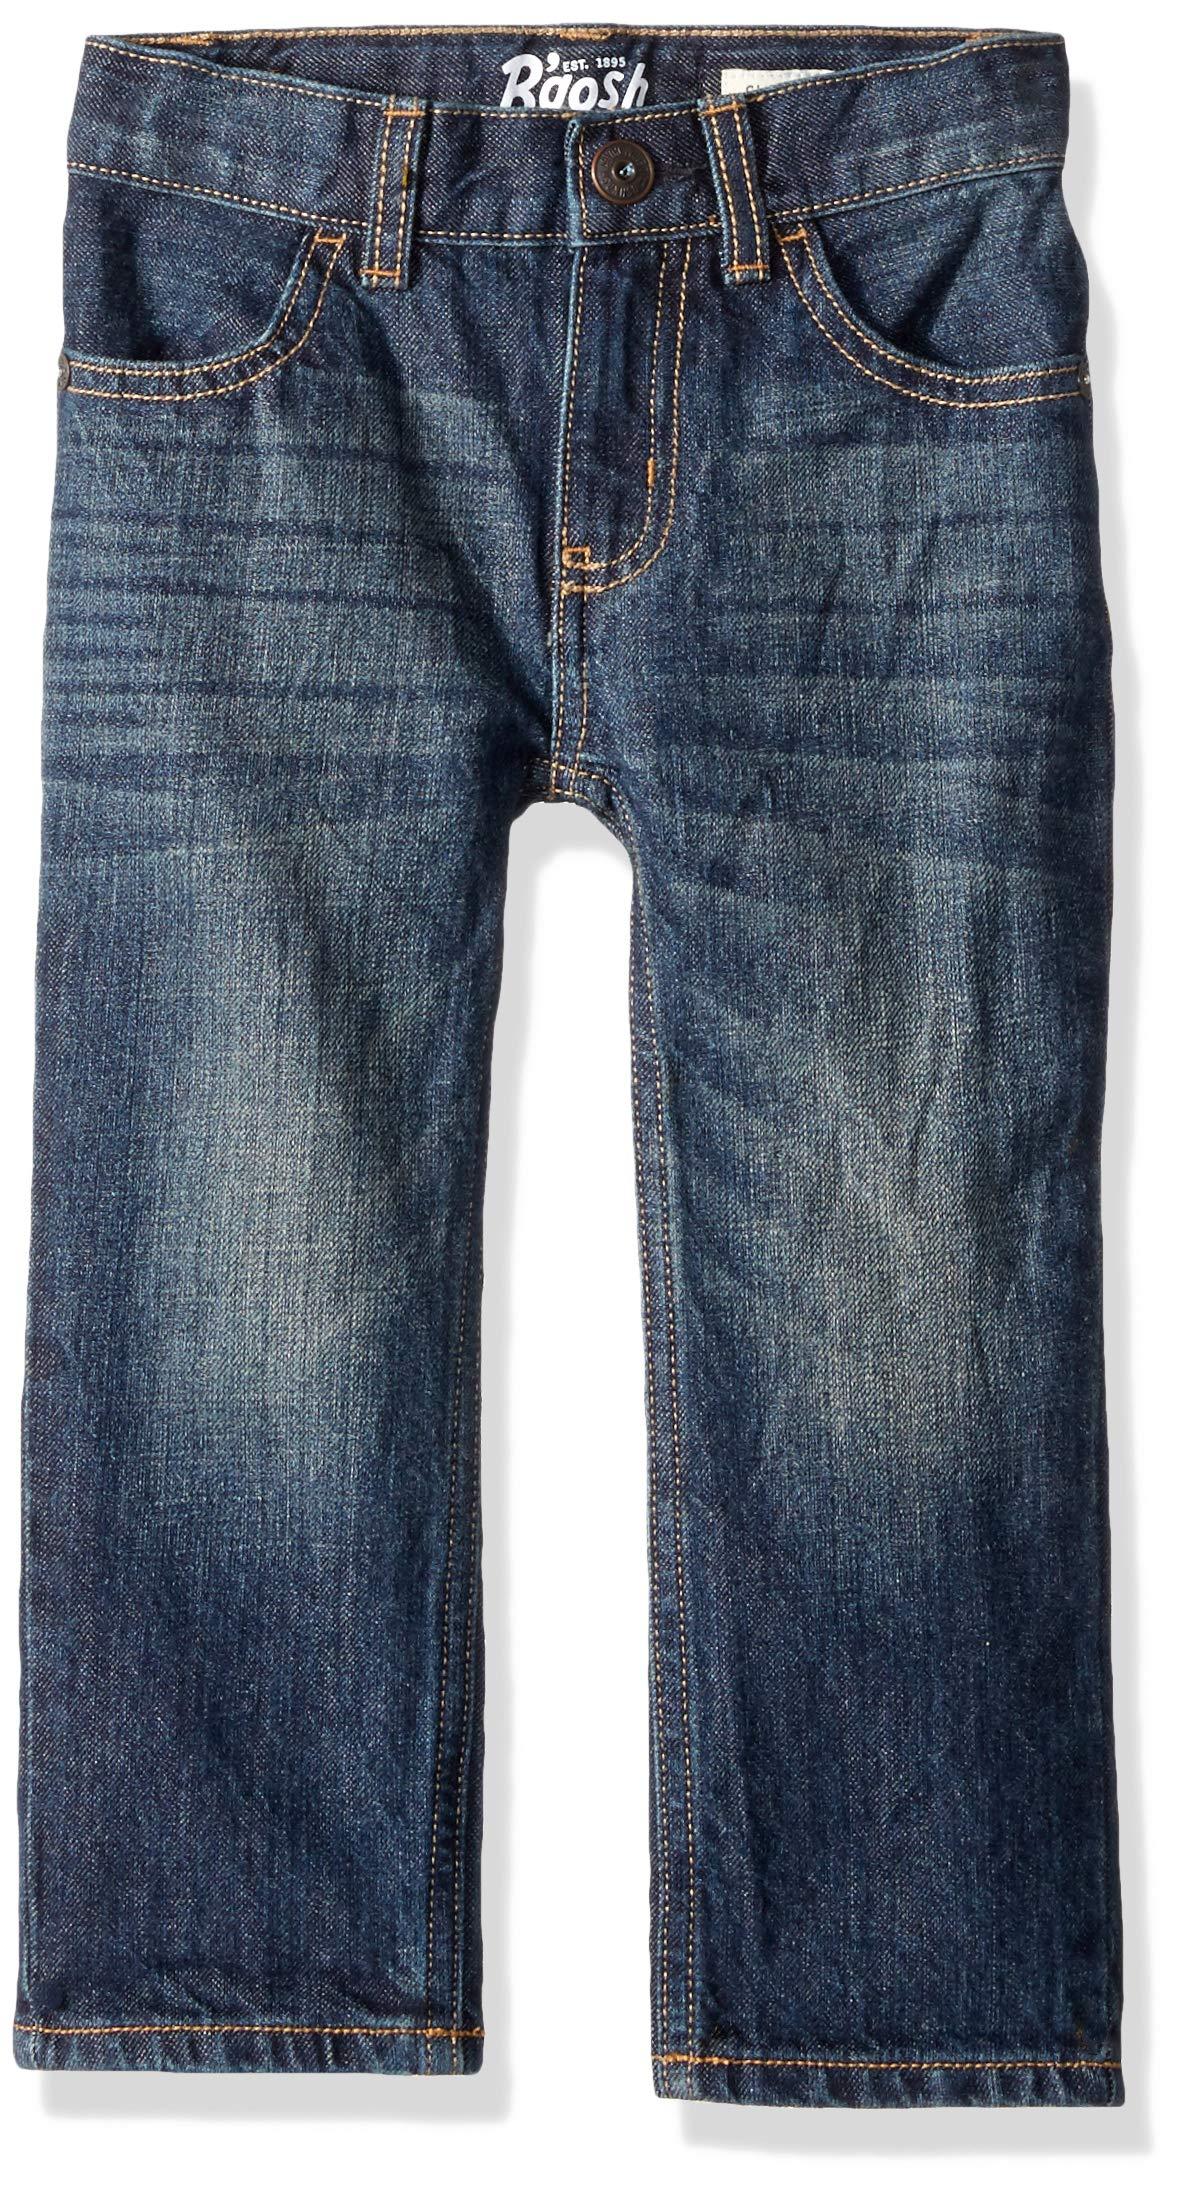 Osh Kosh Boys' Toddler Classic Jeans, Rail Tie True Blue Wash, 4T by OshKosh B'Gosh